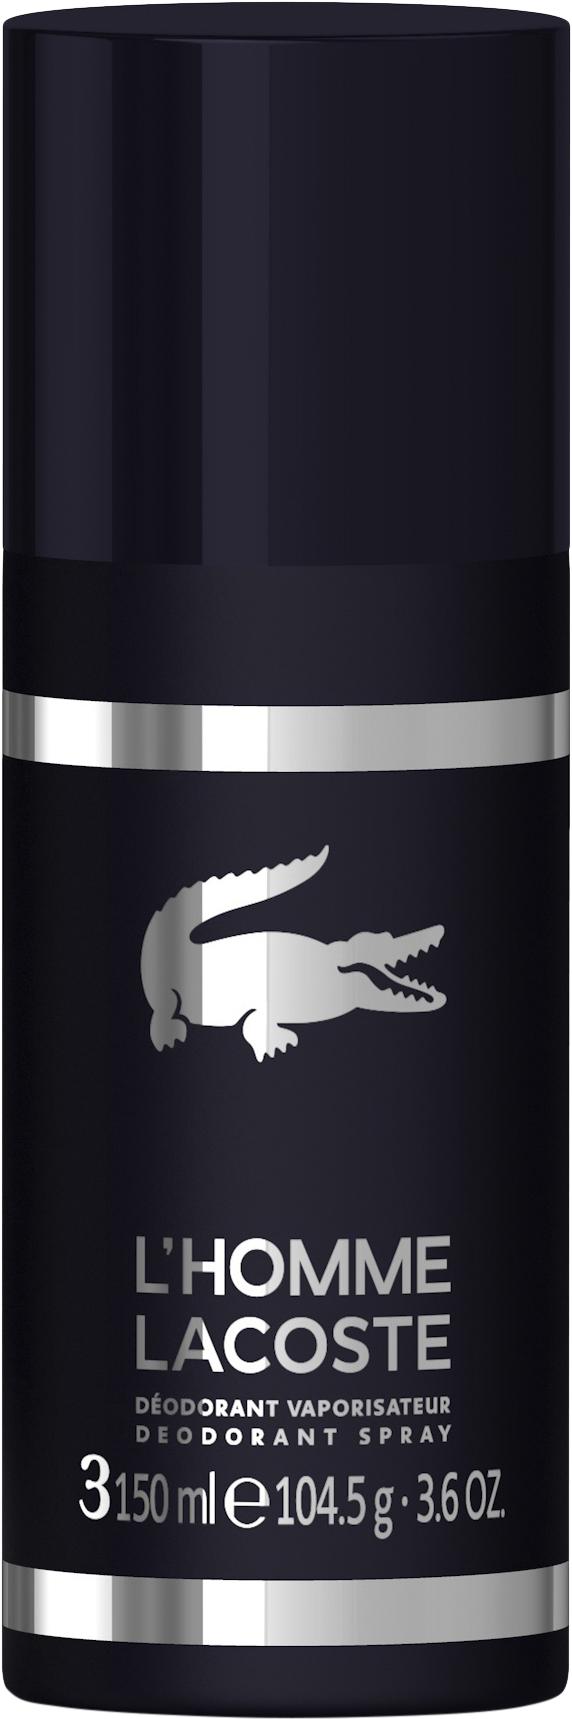 Lacoste - L'Homme Deodorant Spray 150 ml